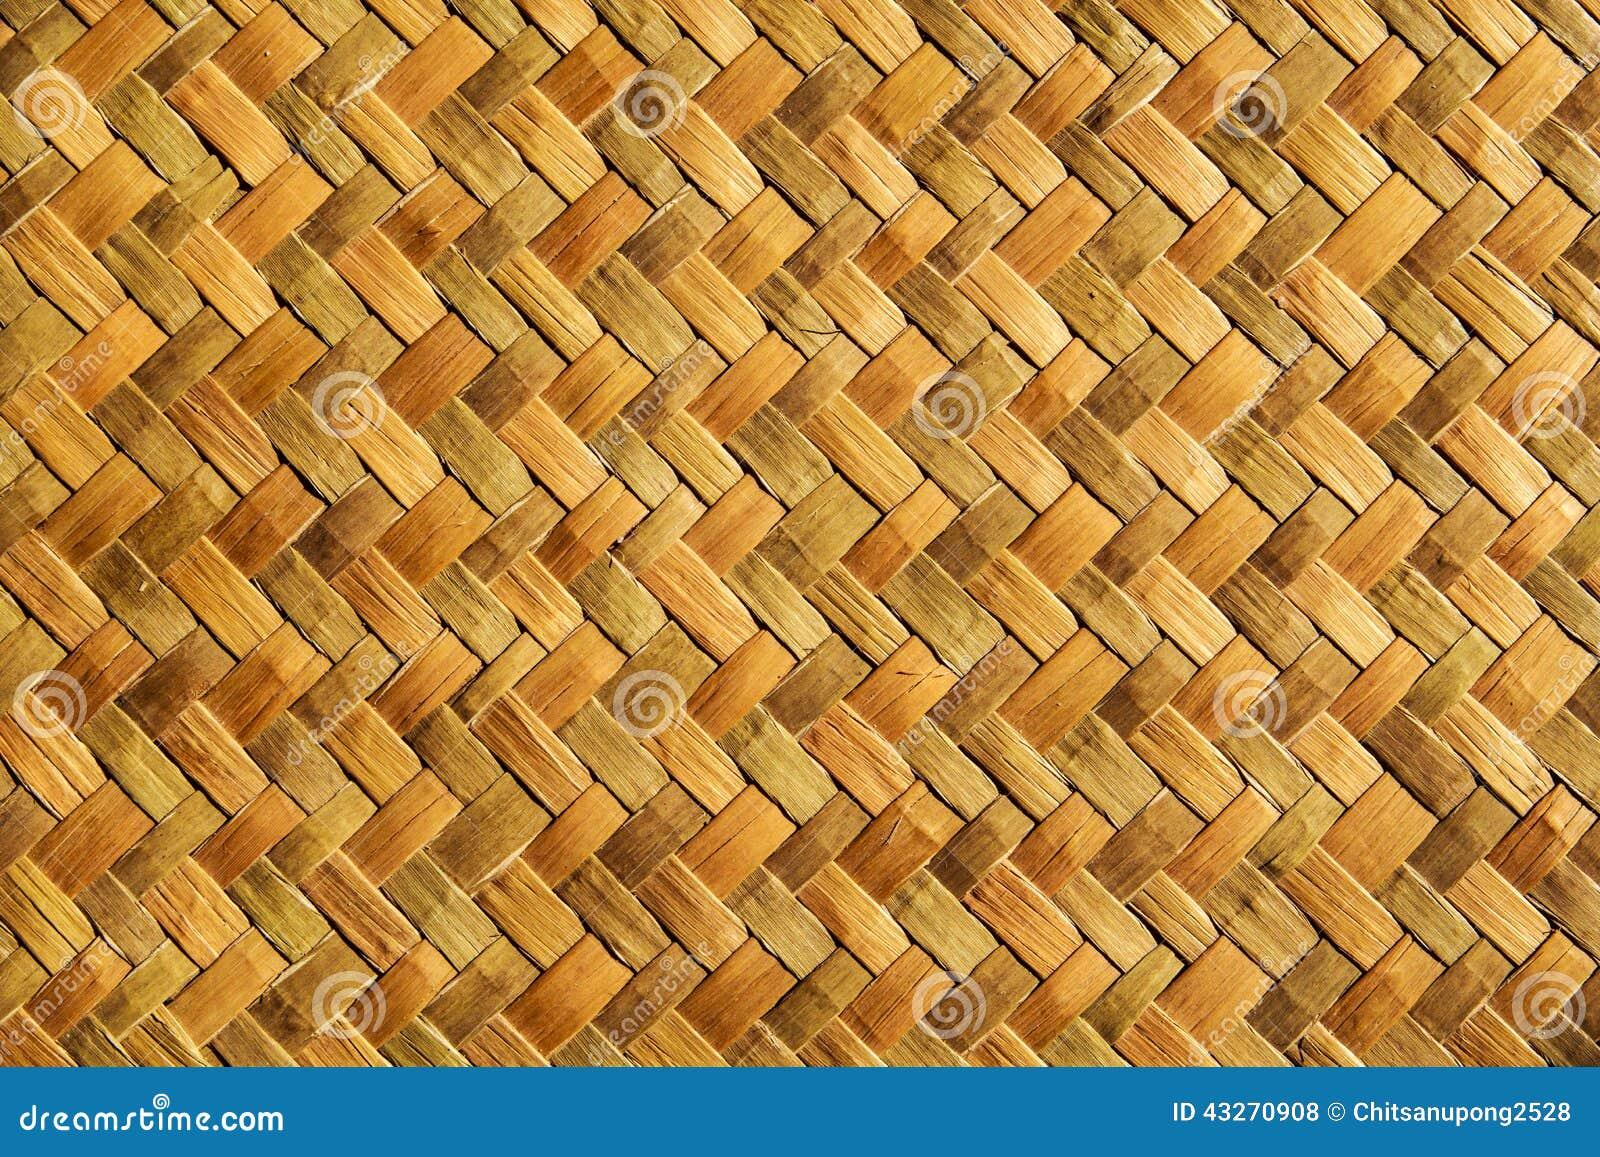 Background Bamboo Knitting Pattern Stock Photo Image Of Organic